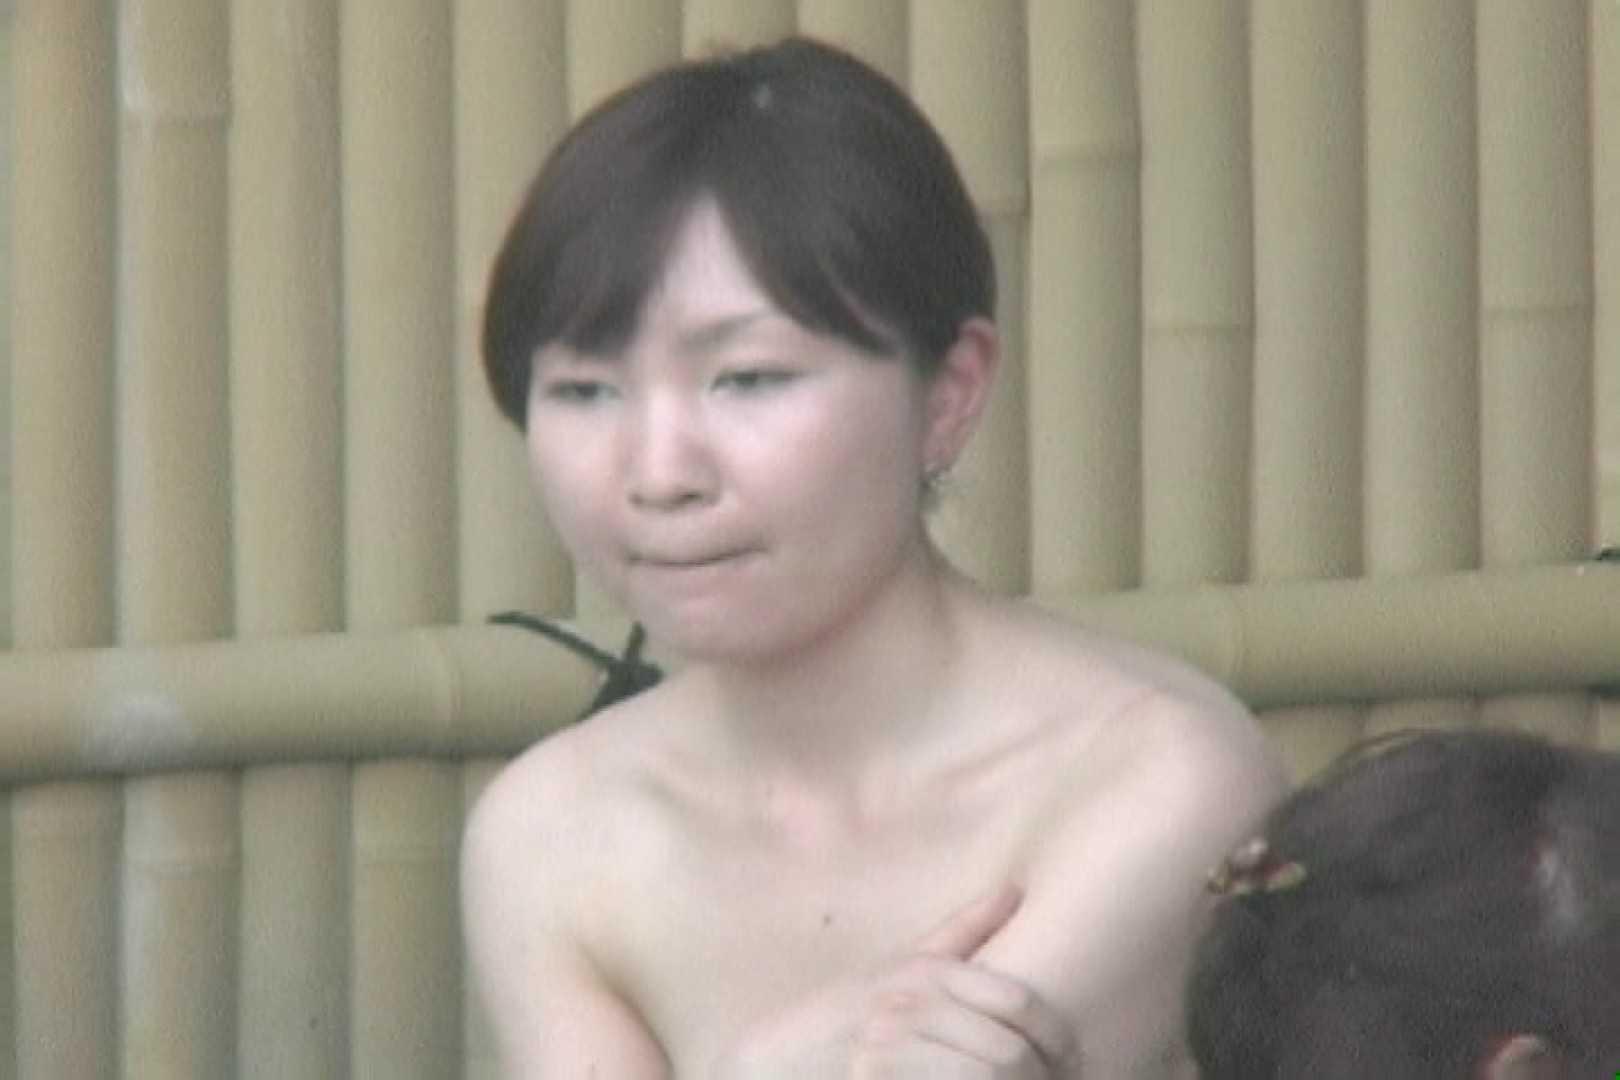 Aquaな露天風呂Vol.695 OLのエロ生活 オマンコ無修正動画無料 35連発 32